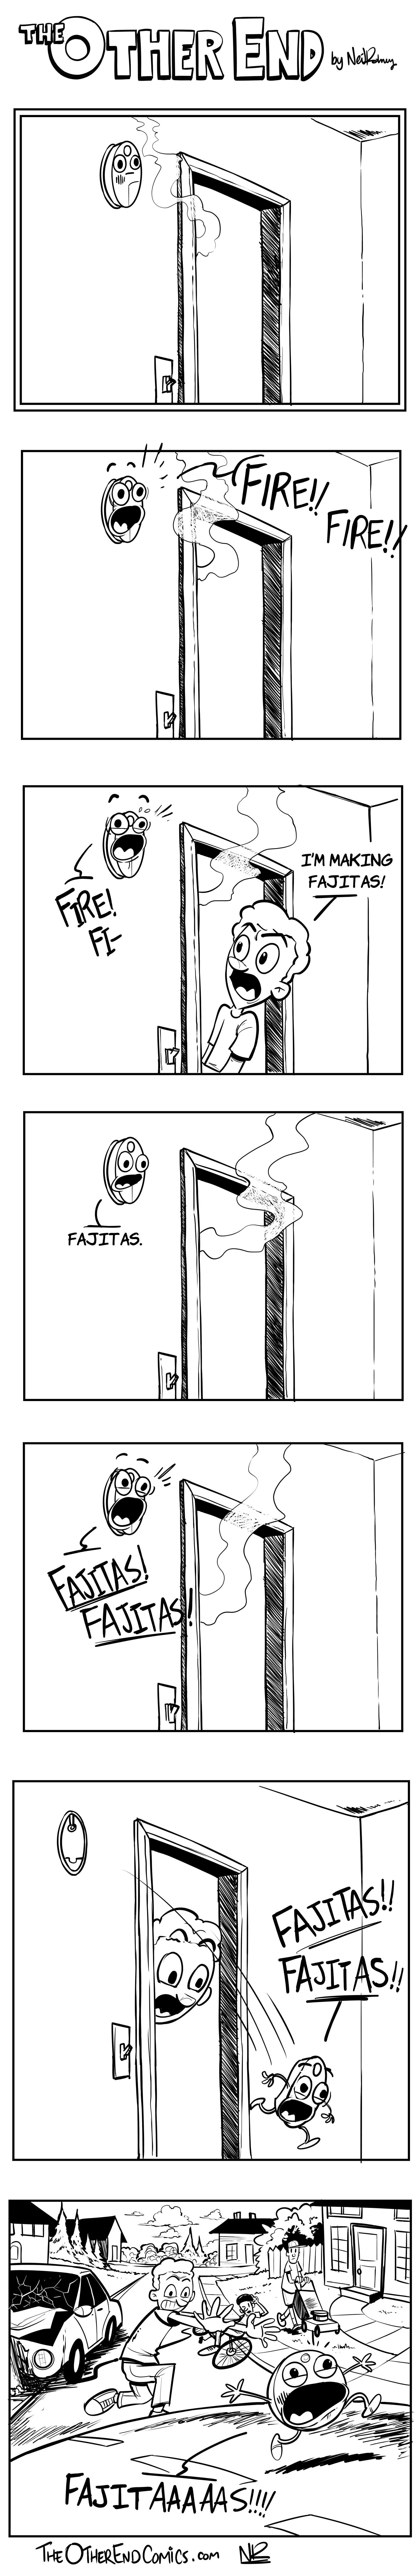 Smoke alarms love fajitas. This comic is so fake.